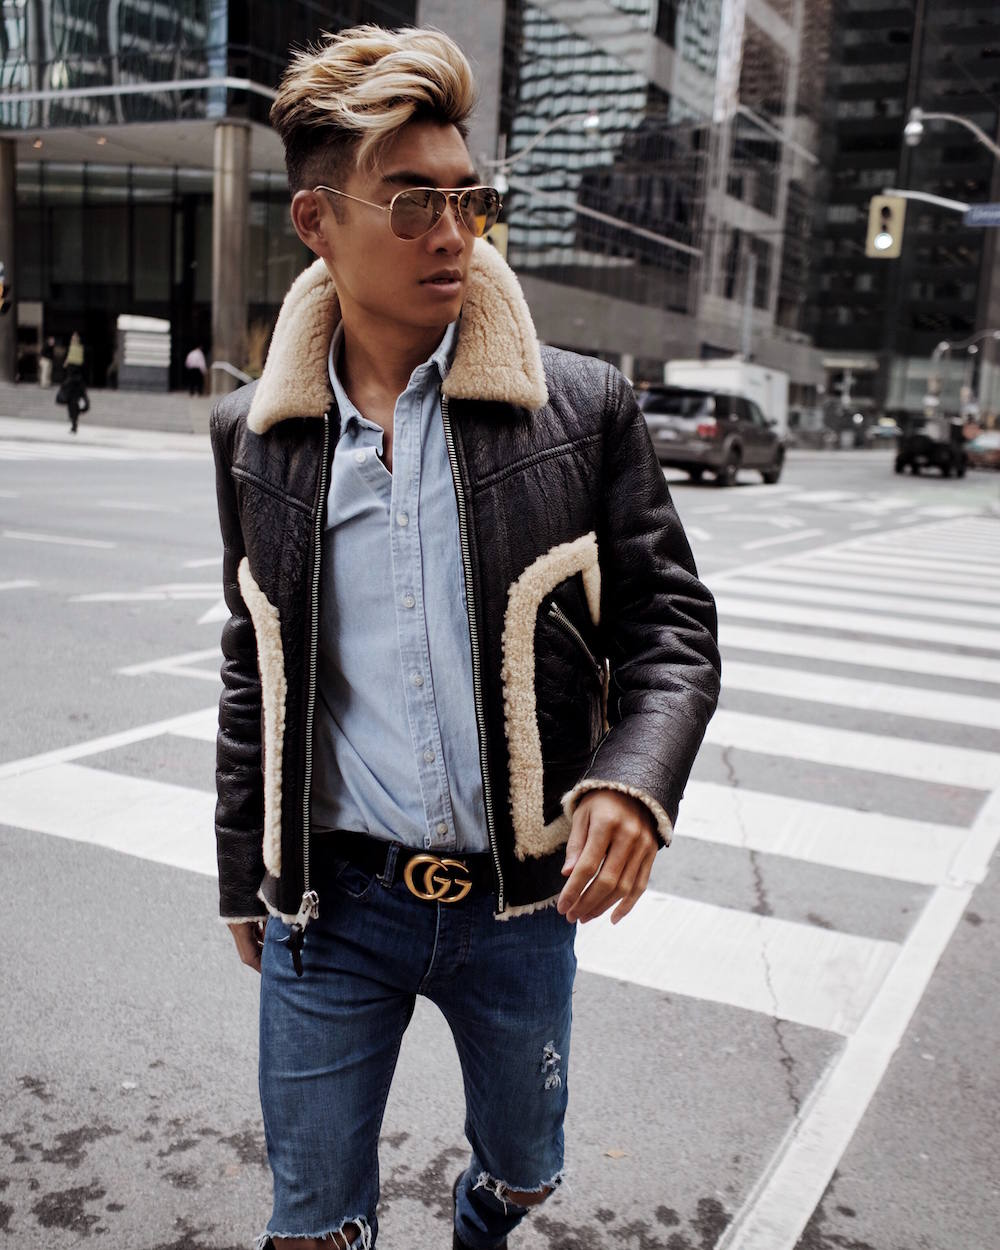 alexander-liang-mens-style-coach-shearling-jacket-04